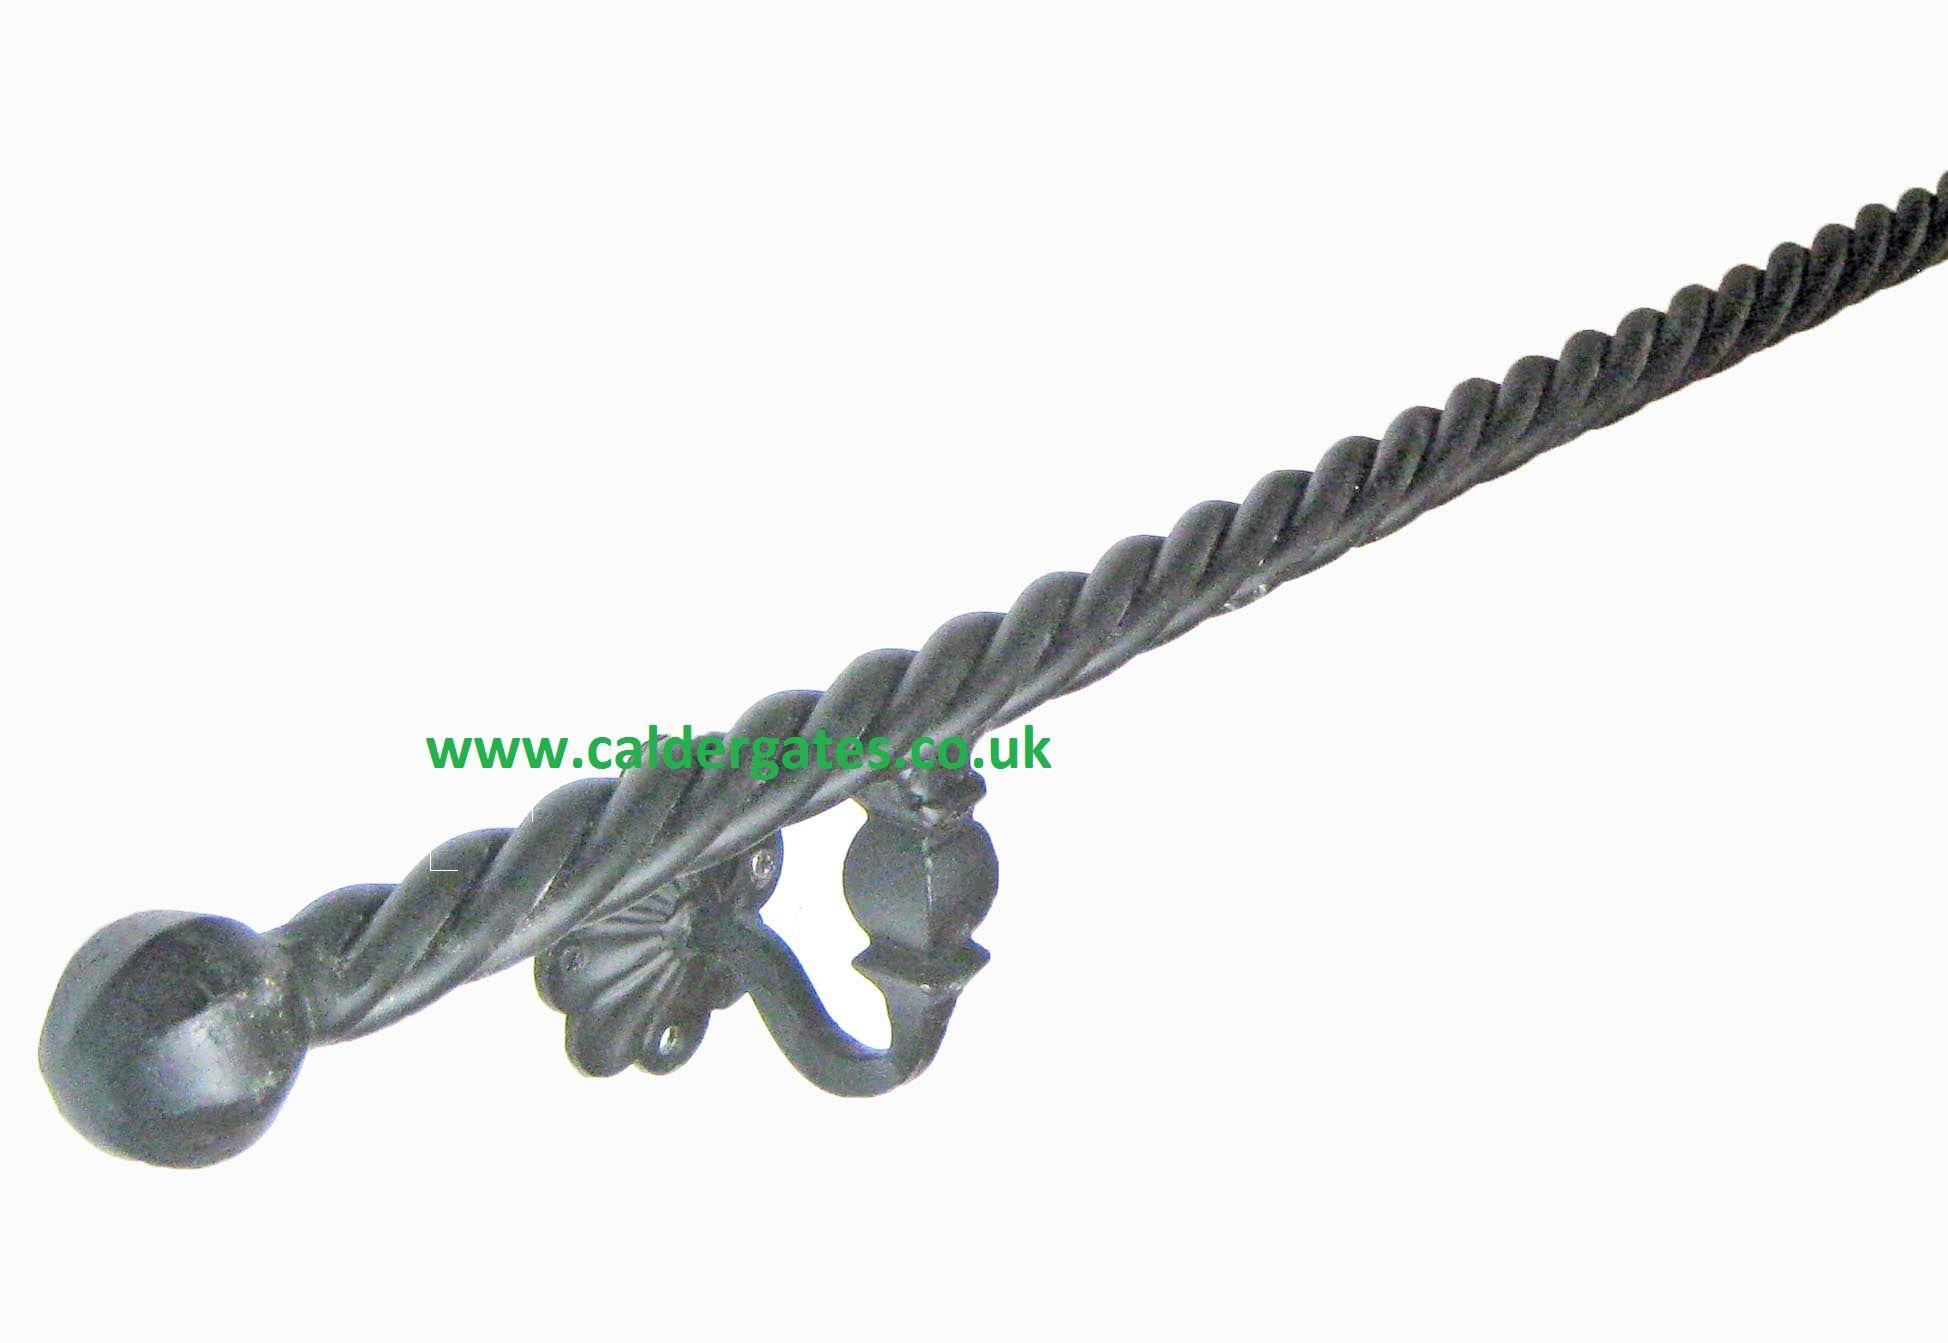 Best Wrought Iron Metal Rope Twist Handrail(画像あり) 640 x 480